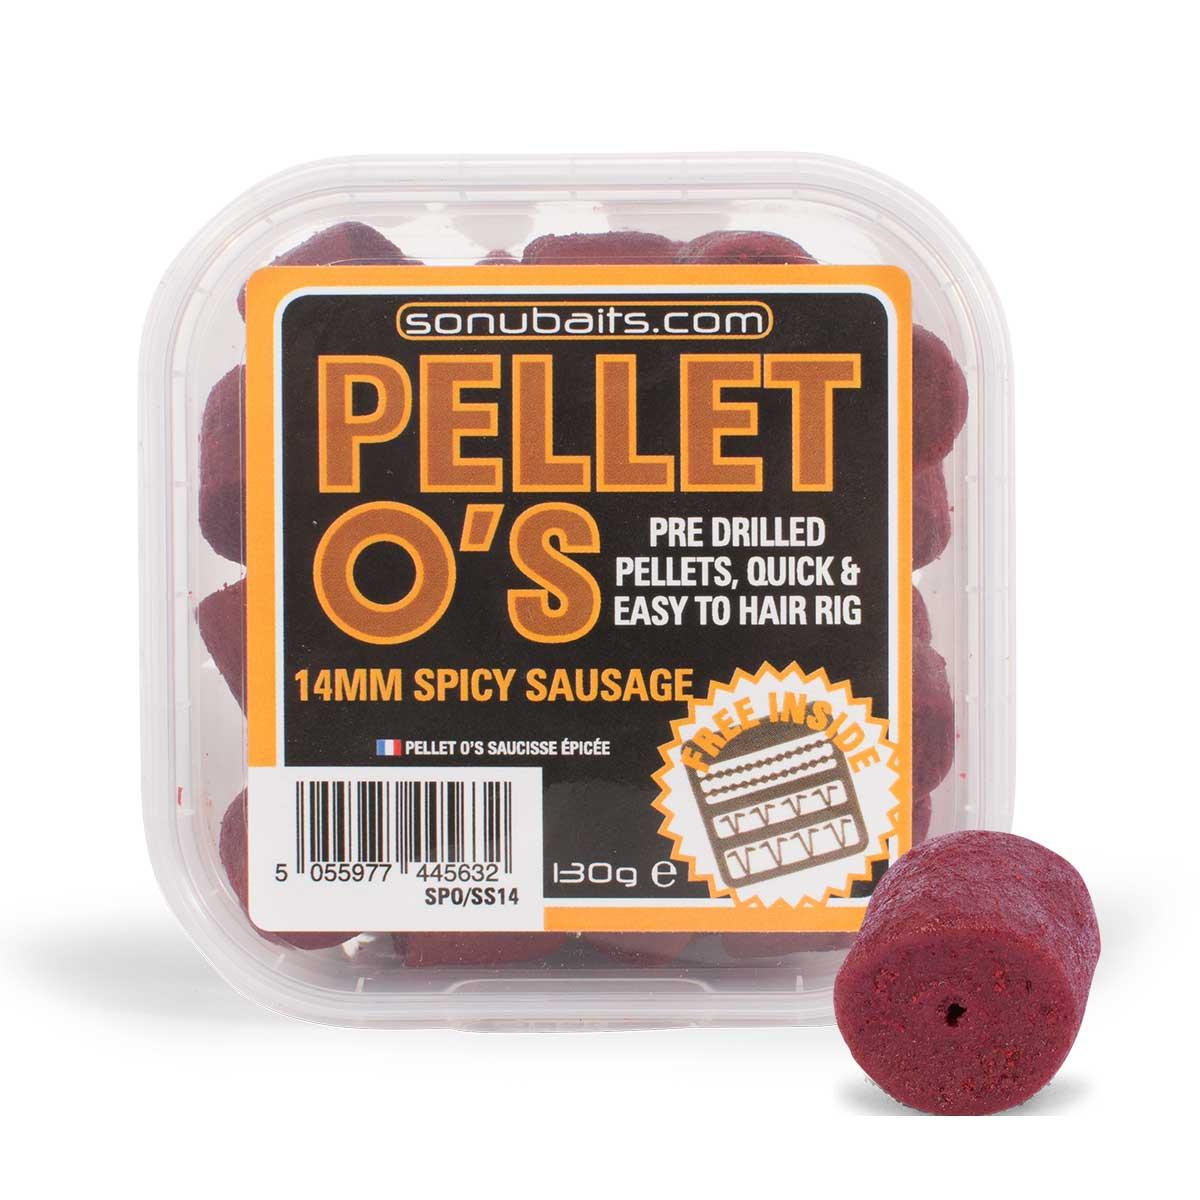 Sonubaits Pellet O's Spicy Sausage 14mm